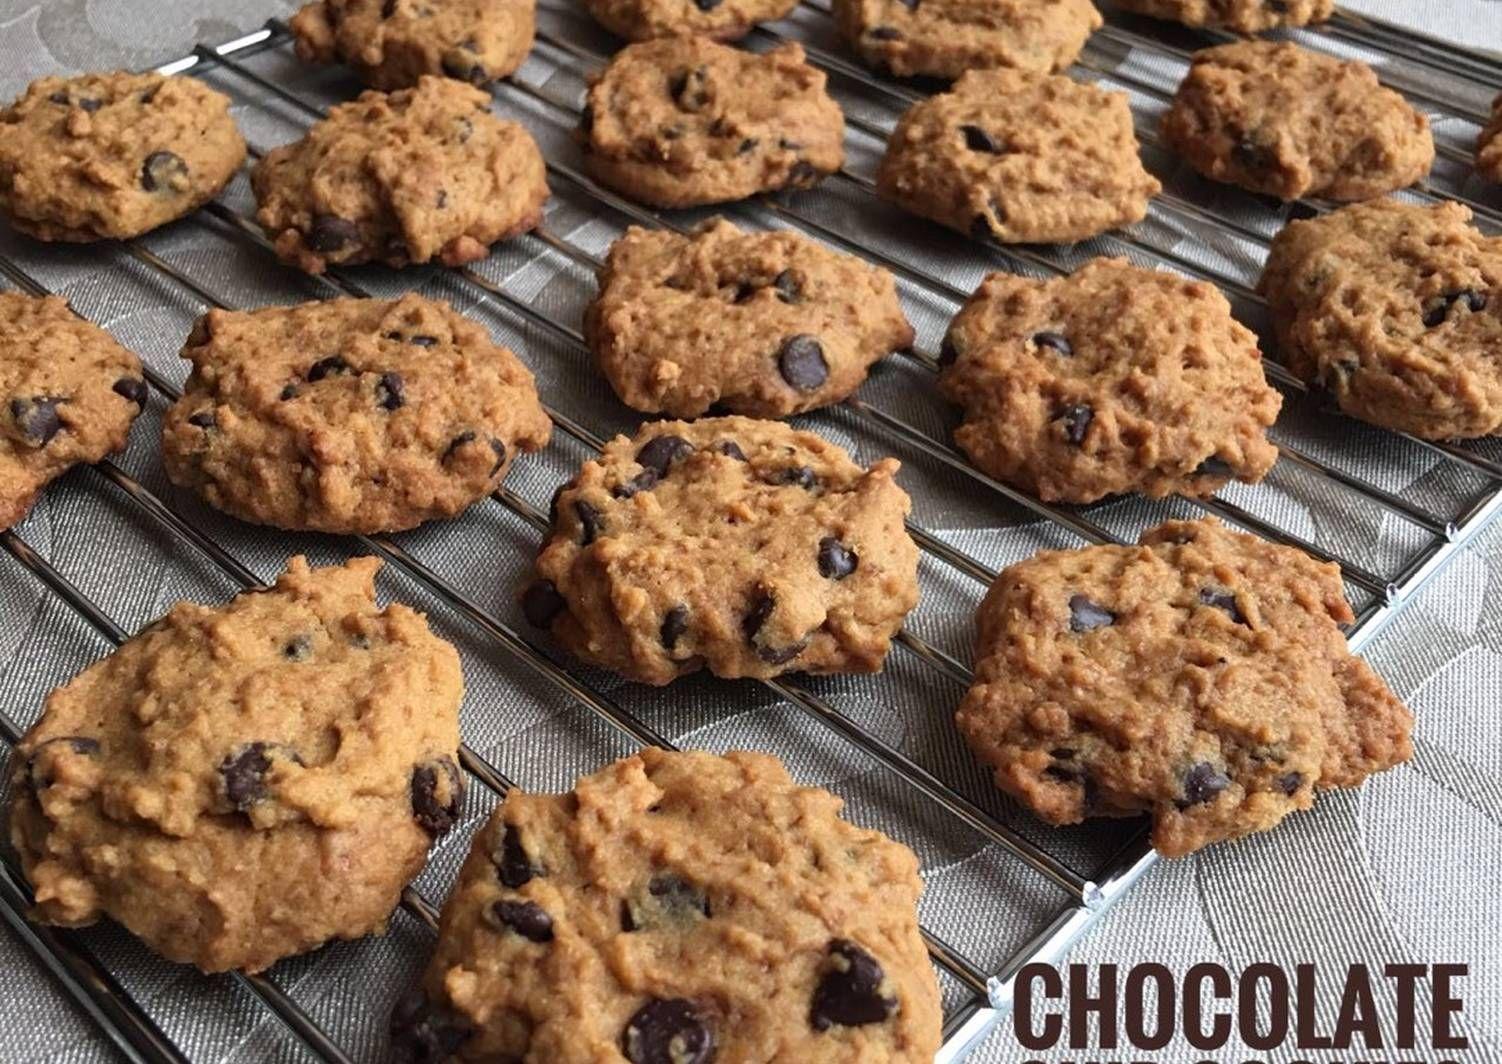 Resep Chocolate Chip Cookies Oleh Shirley Resep Resep Biskuit Kemasan Kue Kering Makanan